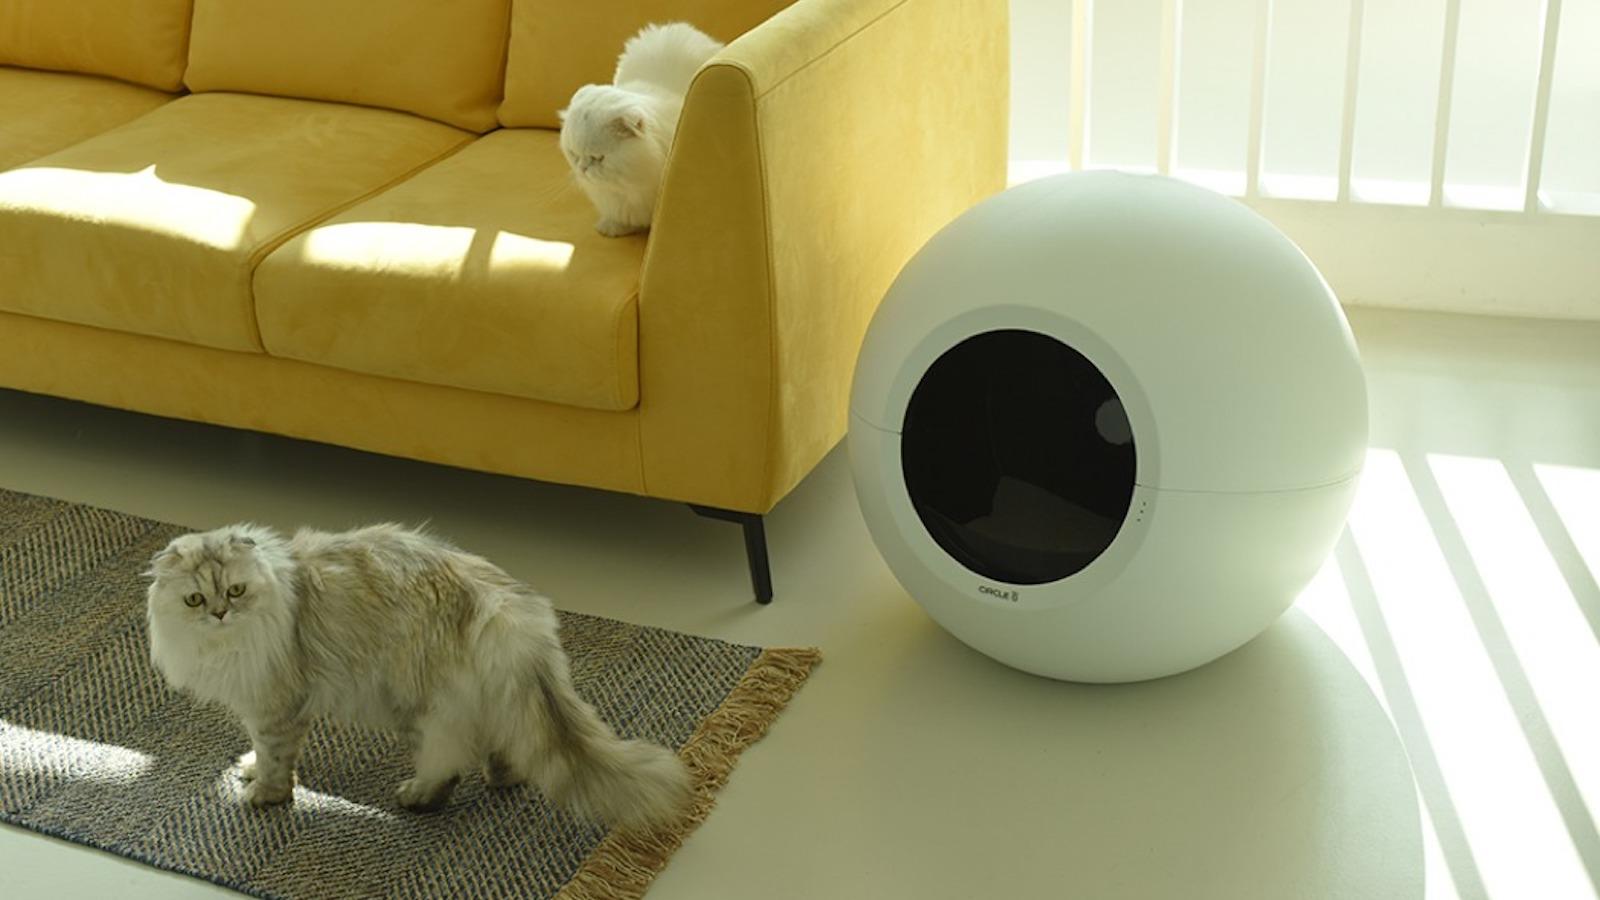 Pluto Circle Zero Smart Litter Box